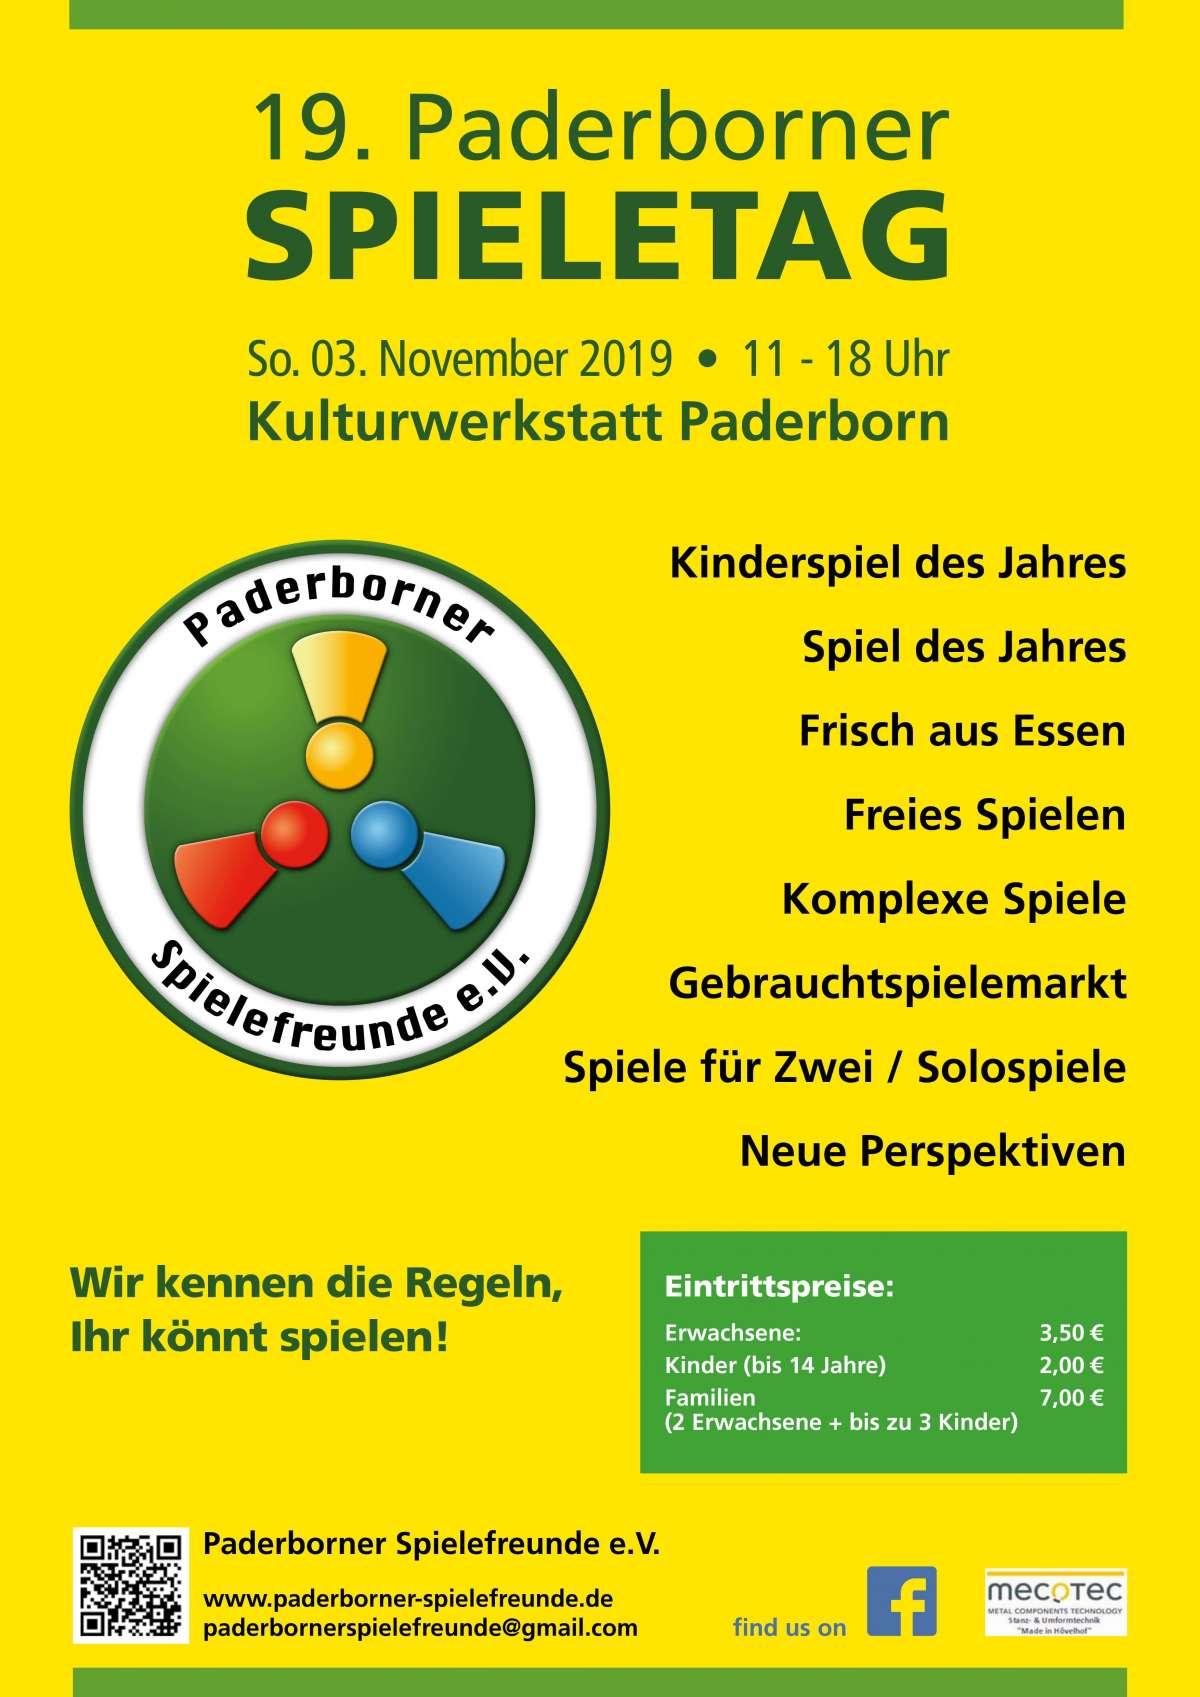 Ww-Terminator: Topf sucht Deckel - Singleparty - Kulturwerkstatt Paderborn - Paderborn